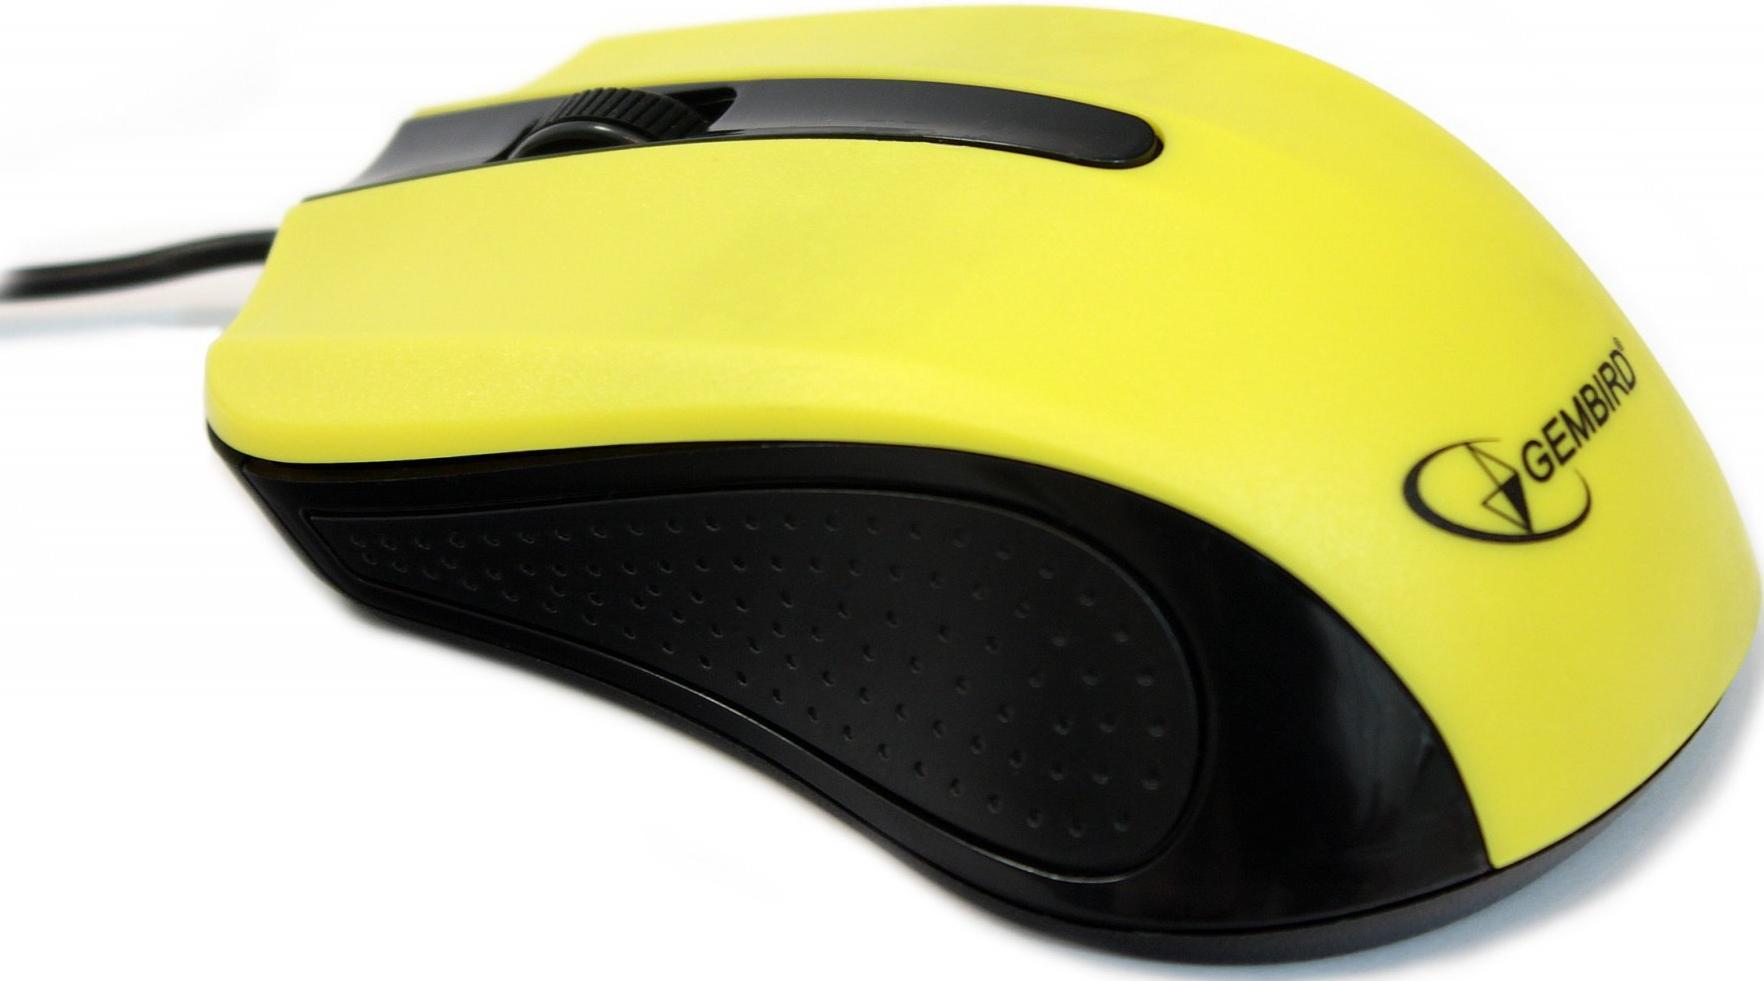 Купить Мишка Gembird MUS-101-Y жовта